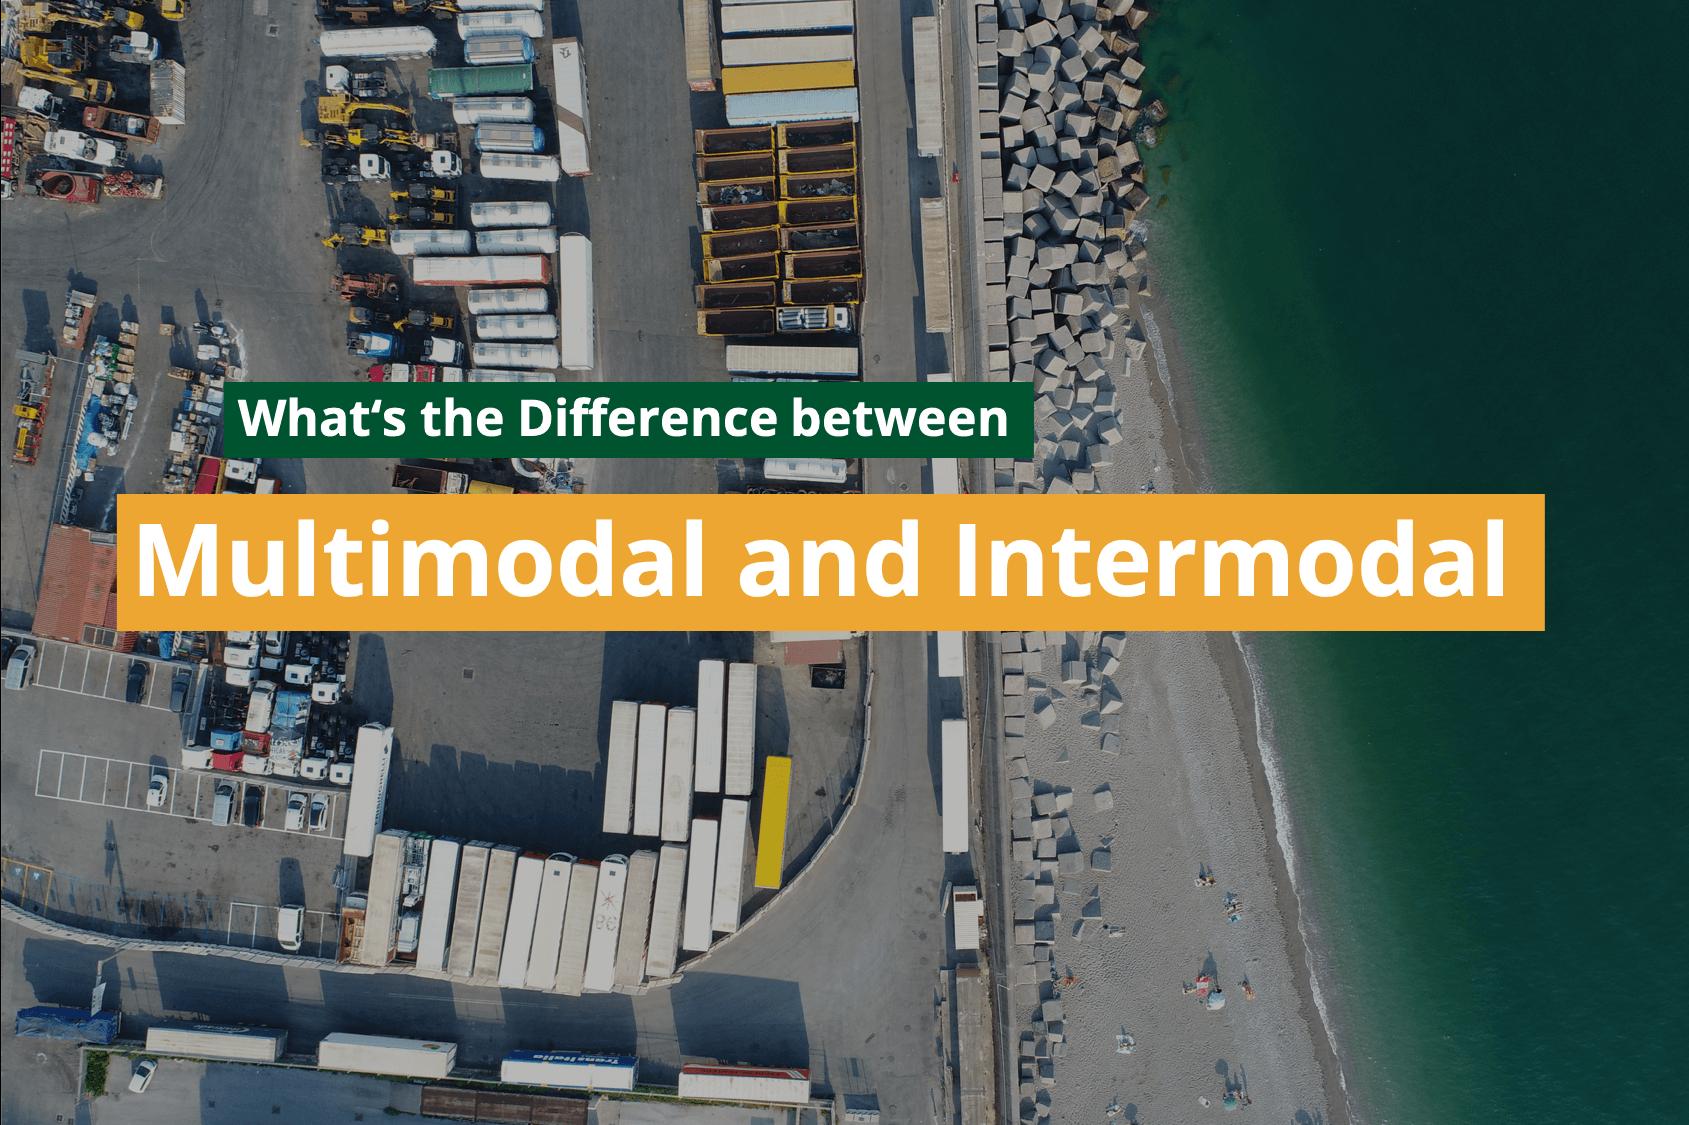 Multimodal and Intermodal Transport Mode explained